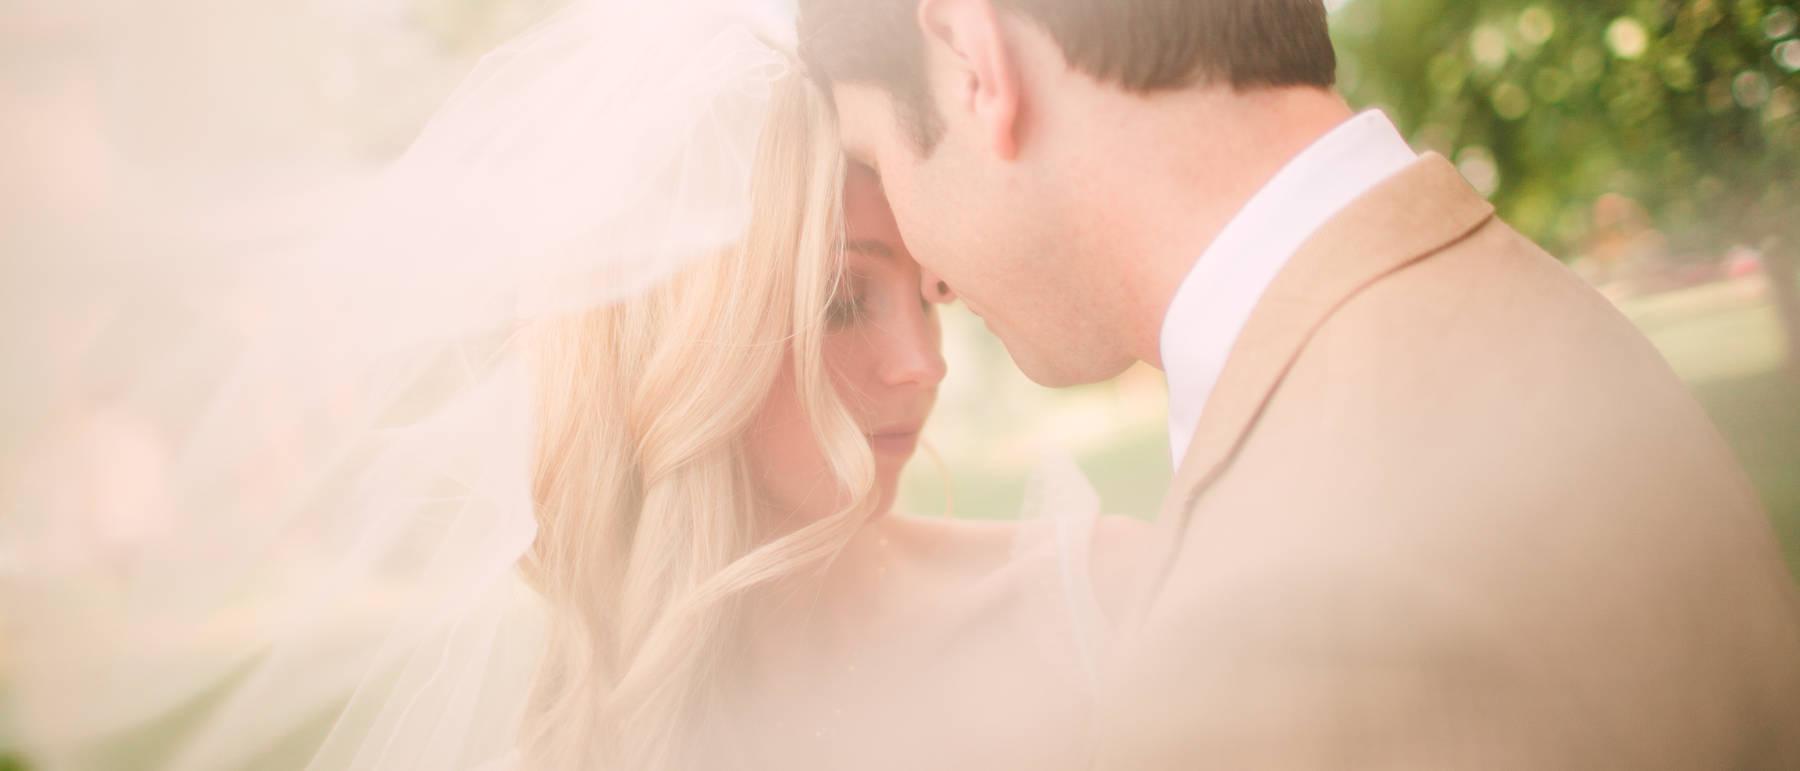 johnandjoseph-wedding-photographer-hz-slider-362